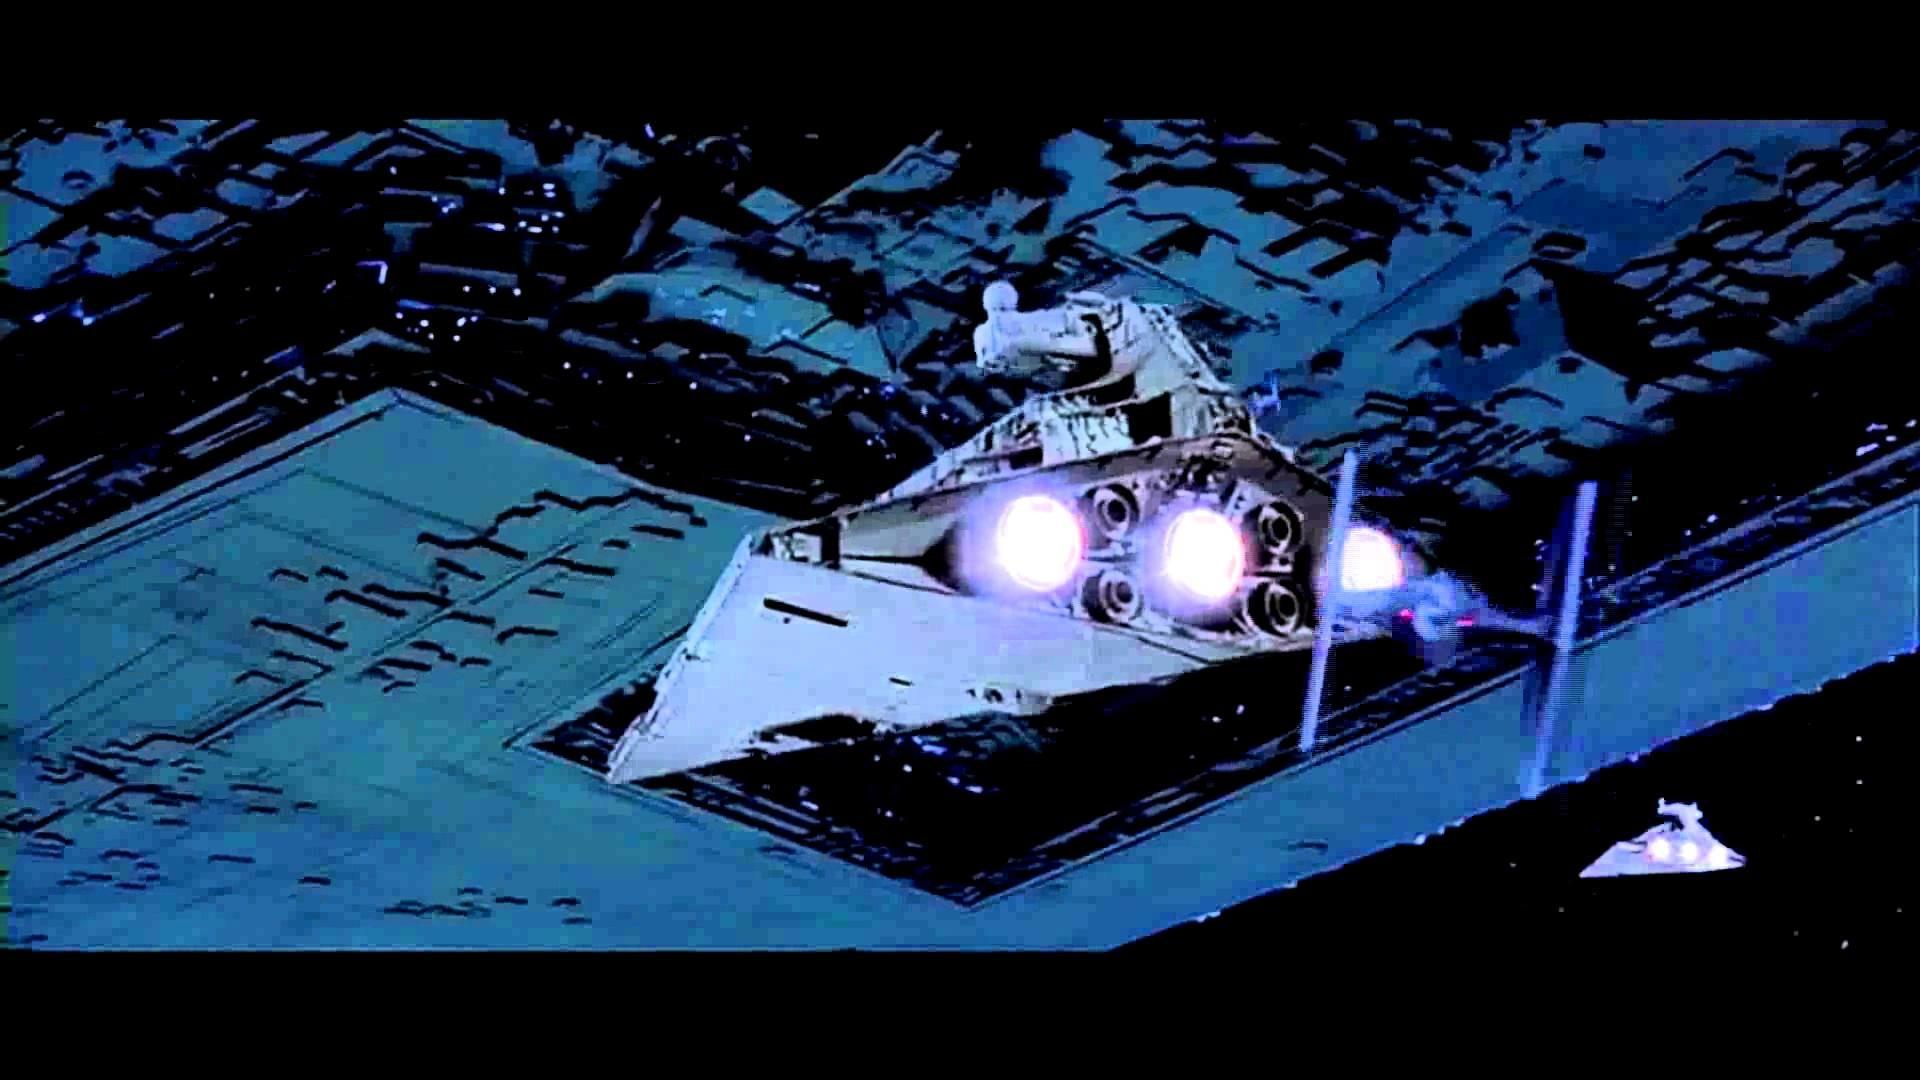 Imperial Fleet Star Wars Episode V The Empire Strikes Back HD – YouTube